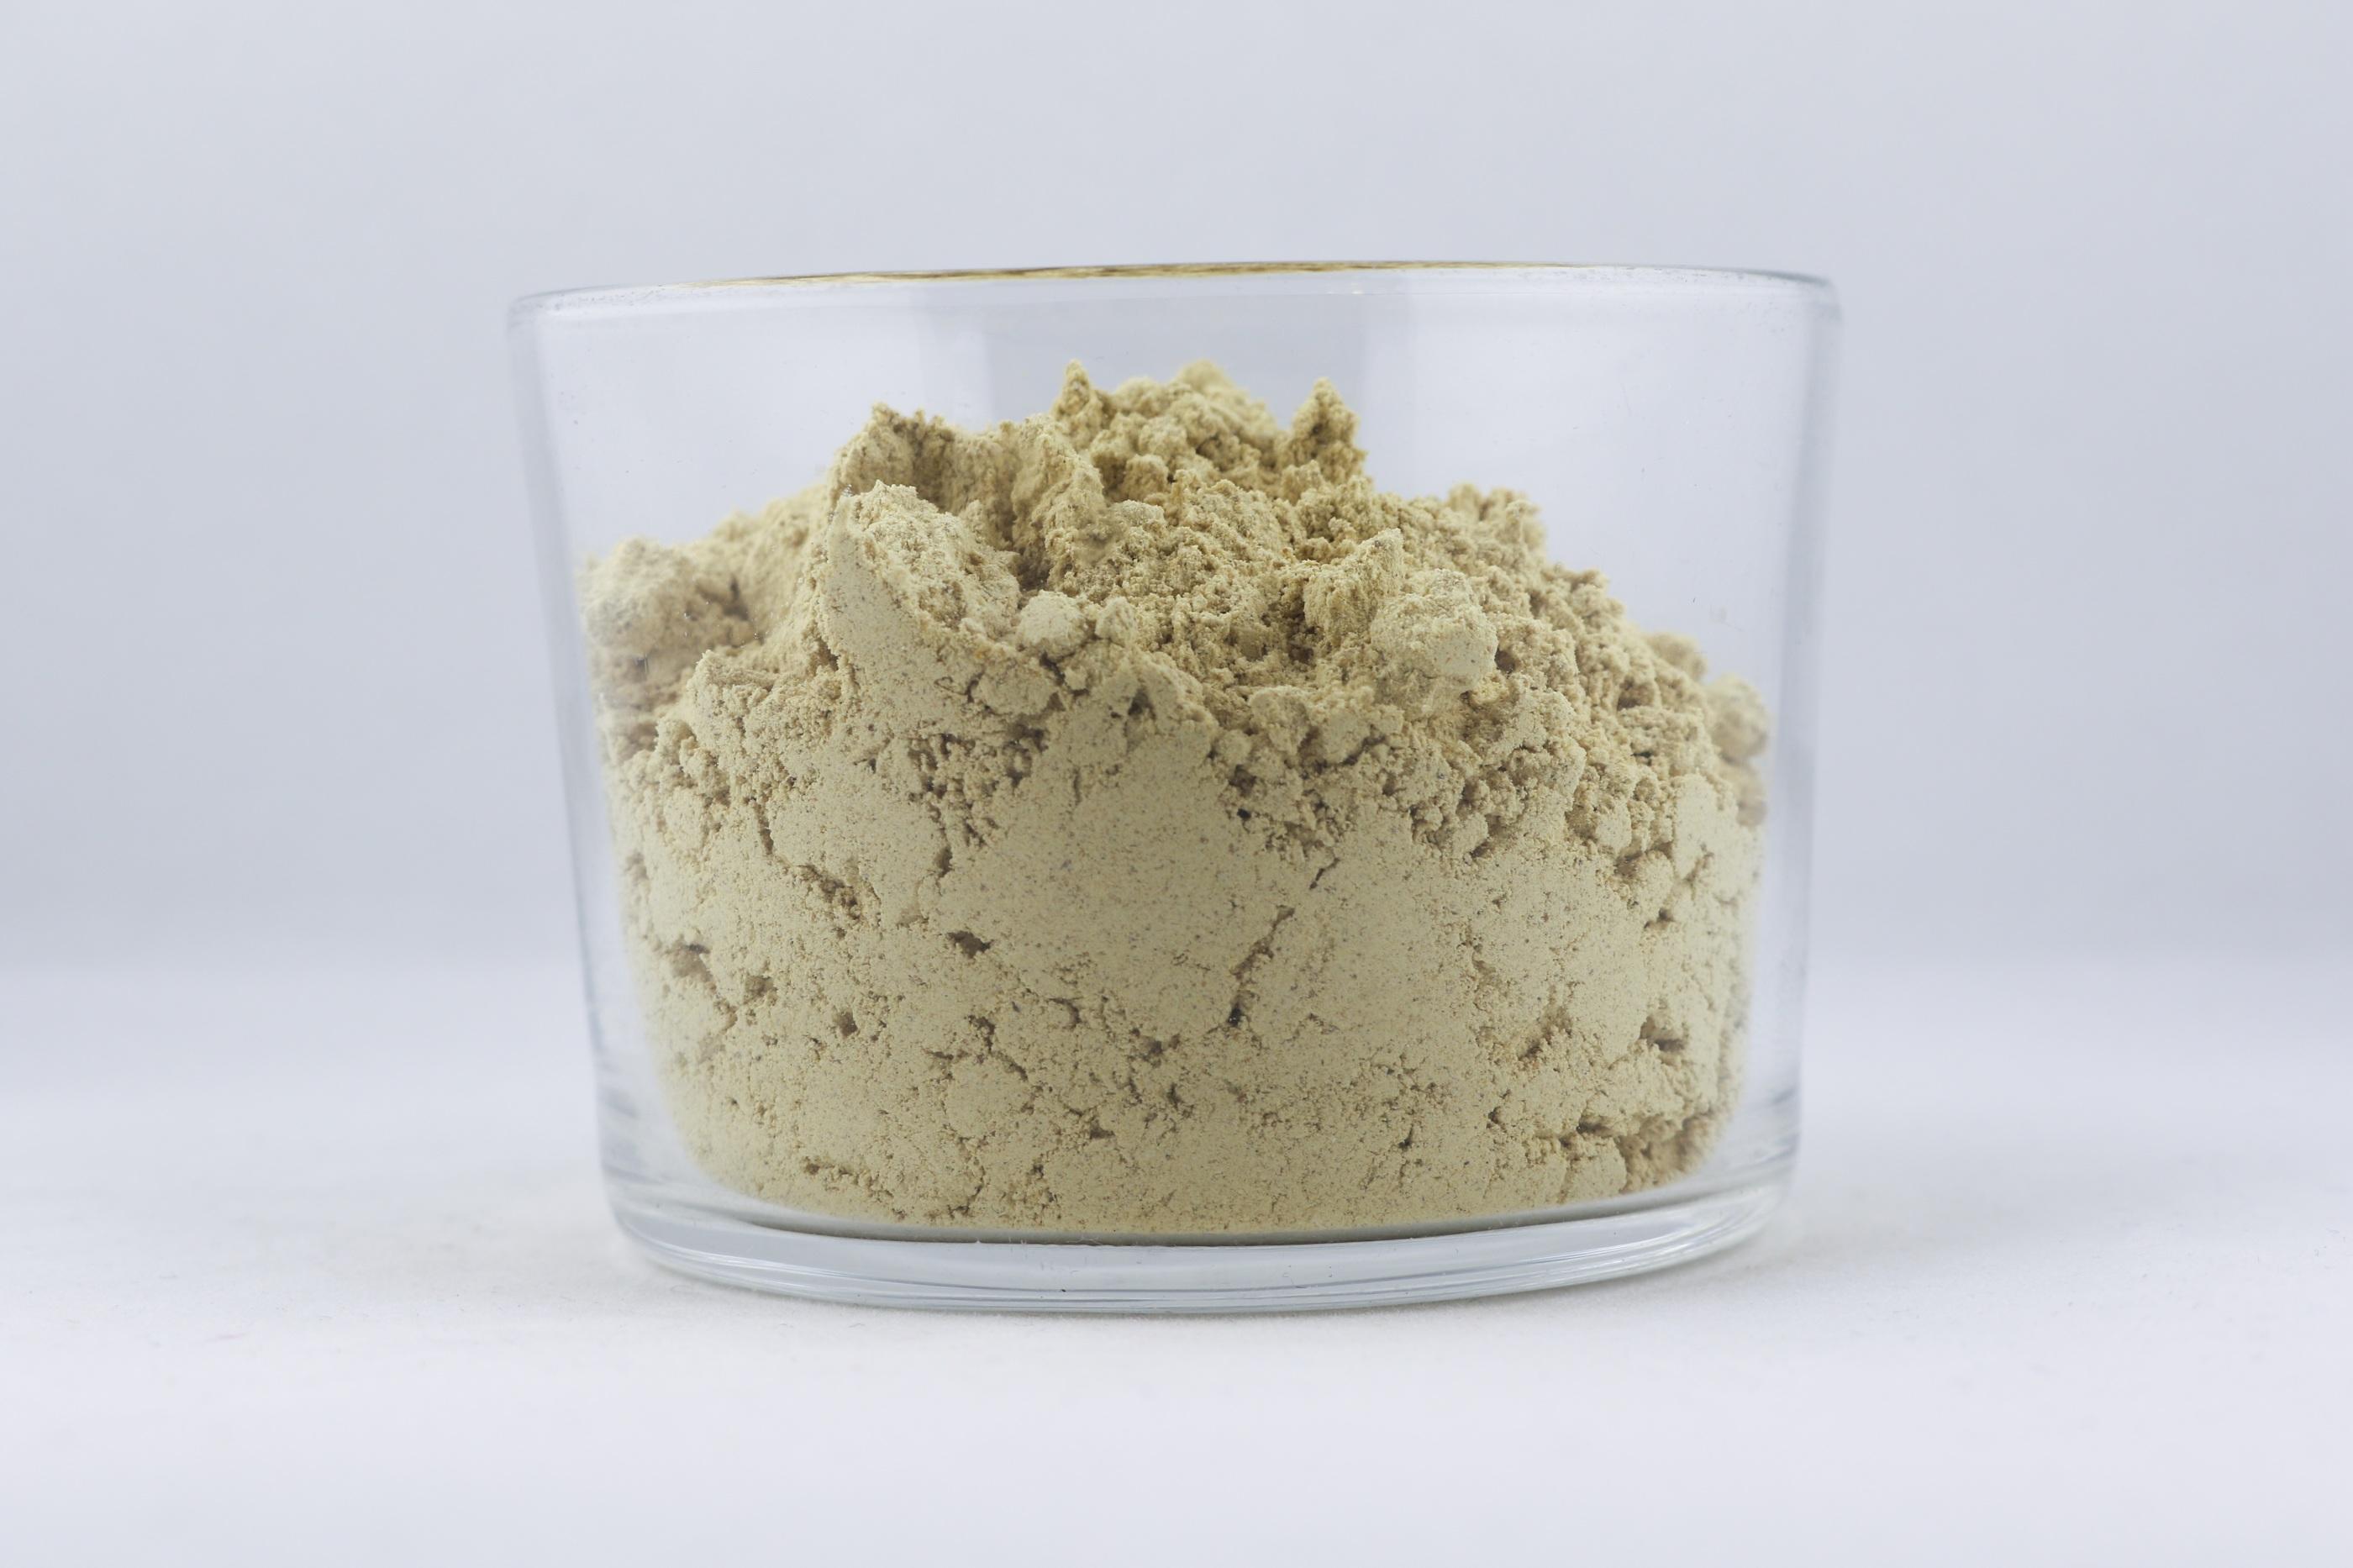 Haritaki Wellness Ayurveda Halmstadmassören Halmstad Sverige Sweden svensk pulver lösvikt eko ekologiskt